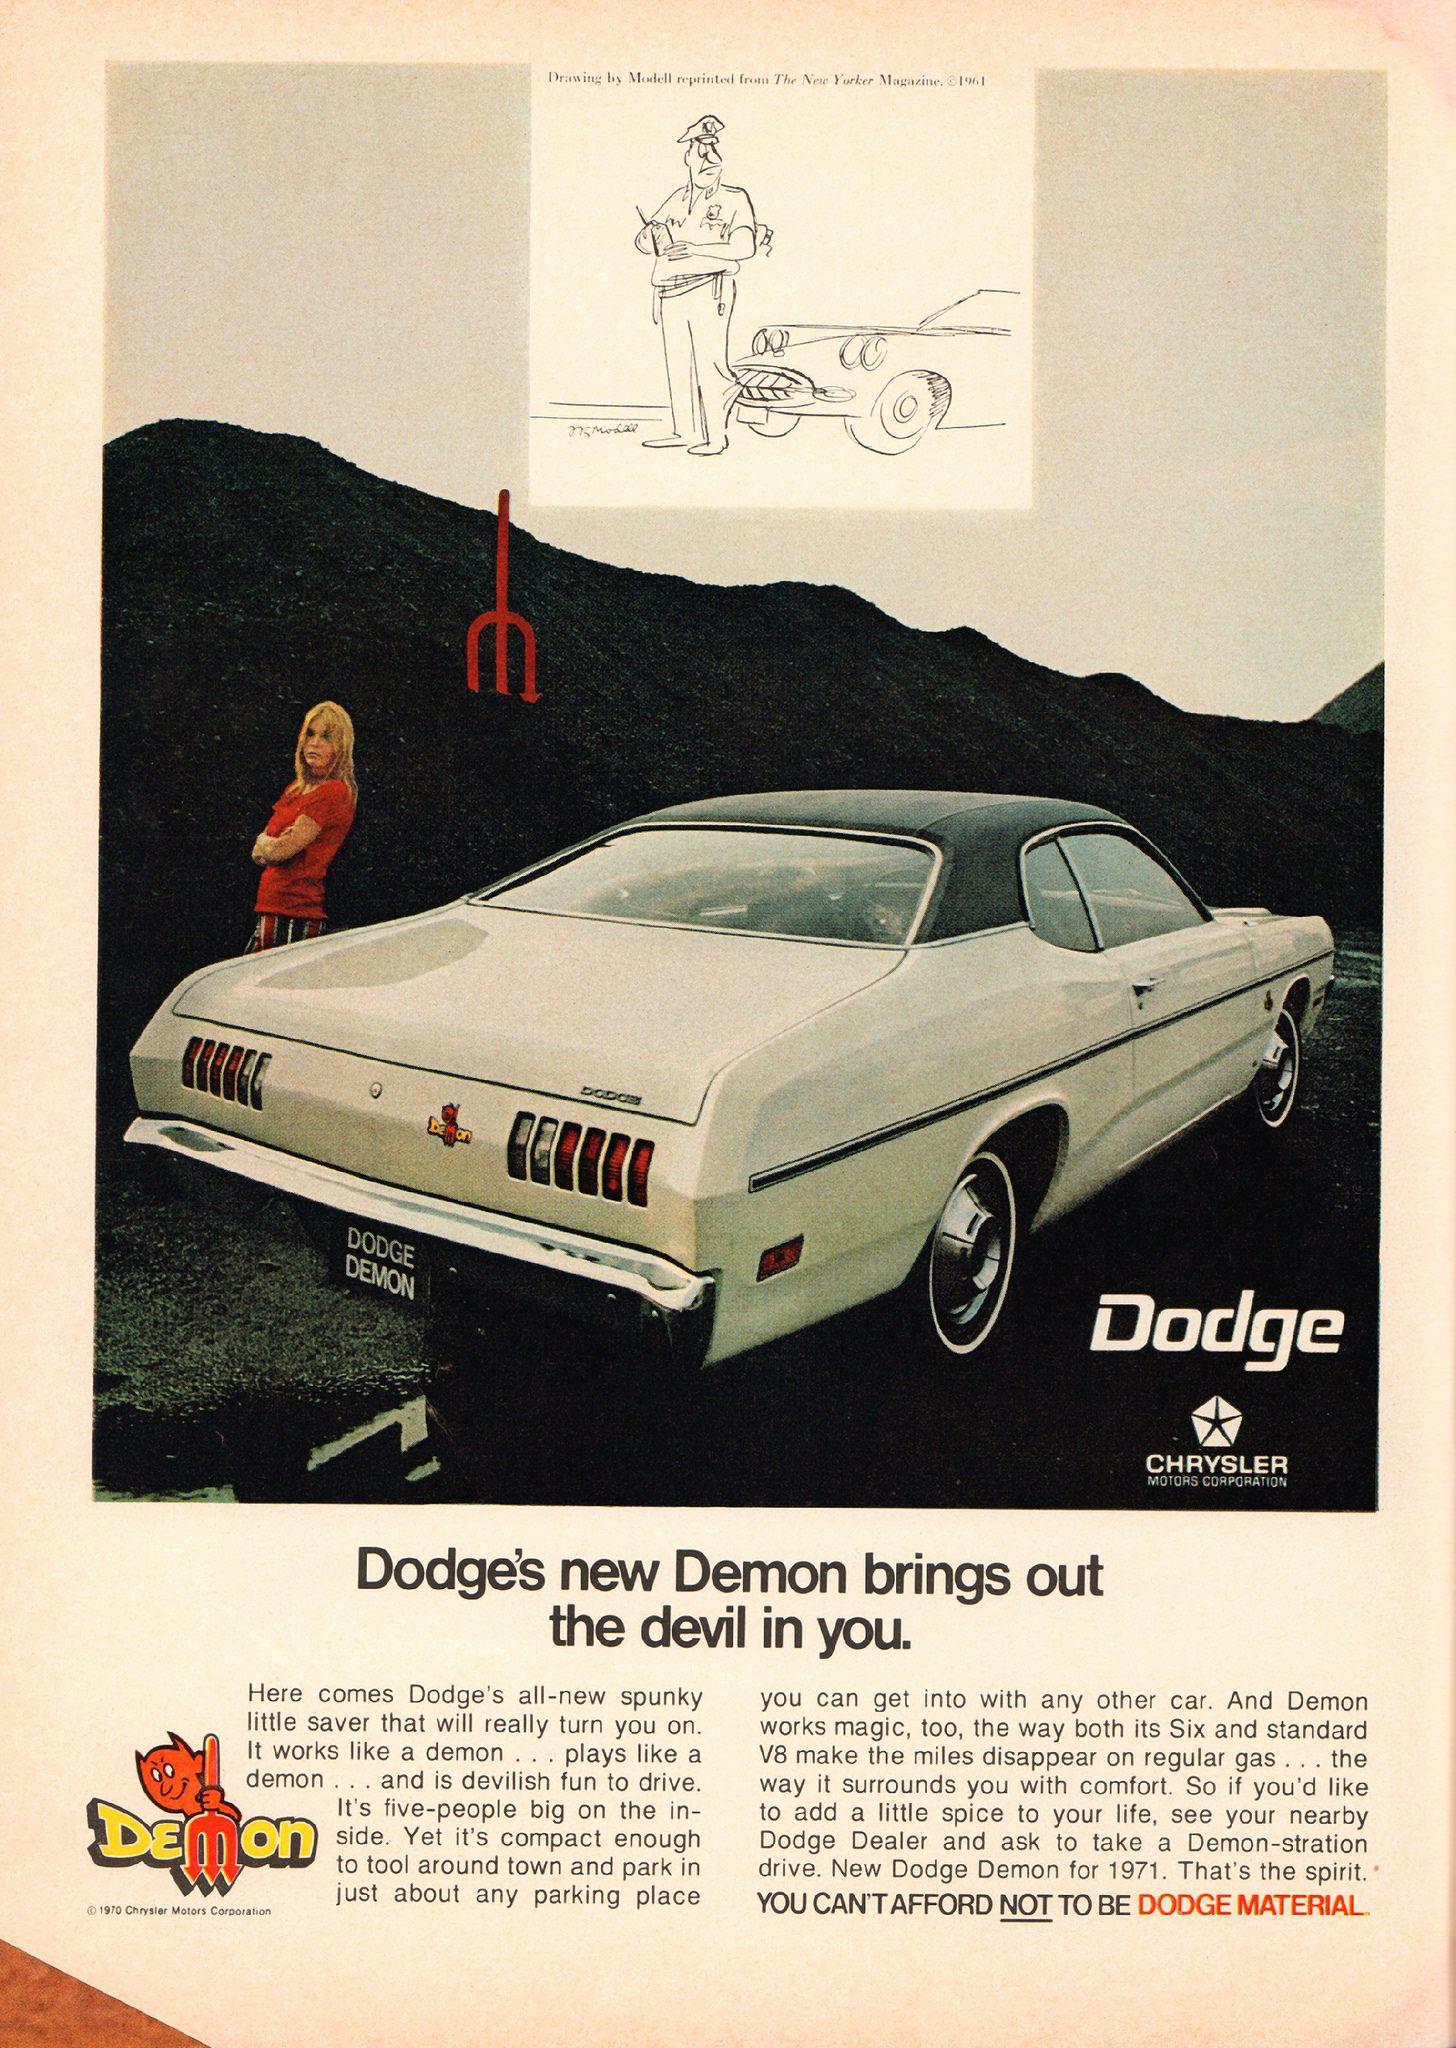 1971 Dodge Demon Advertisement Playboy November 1970